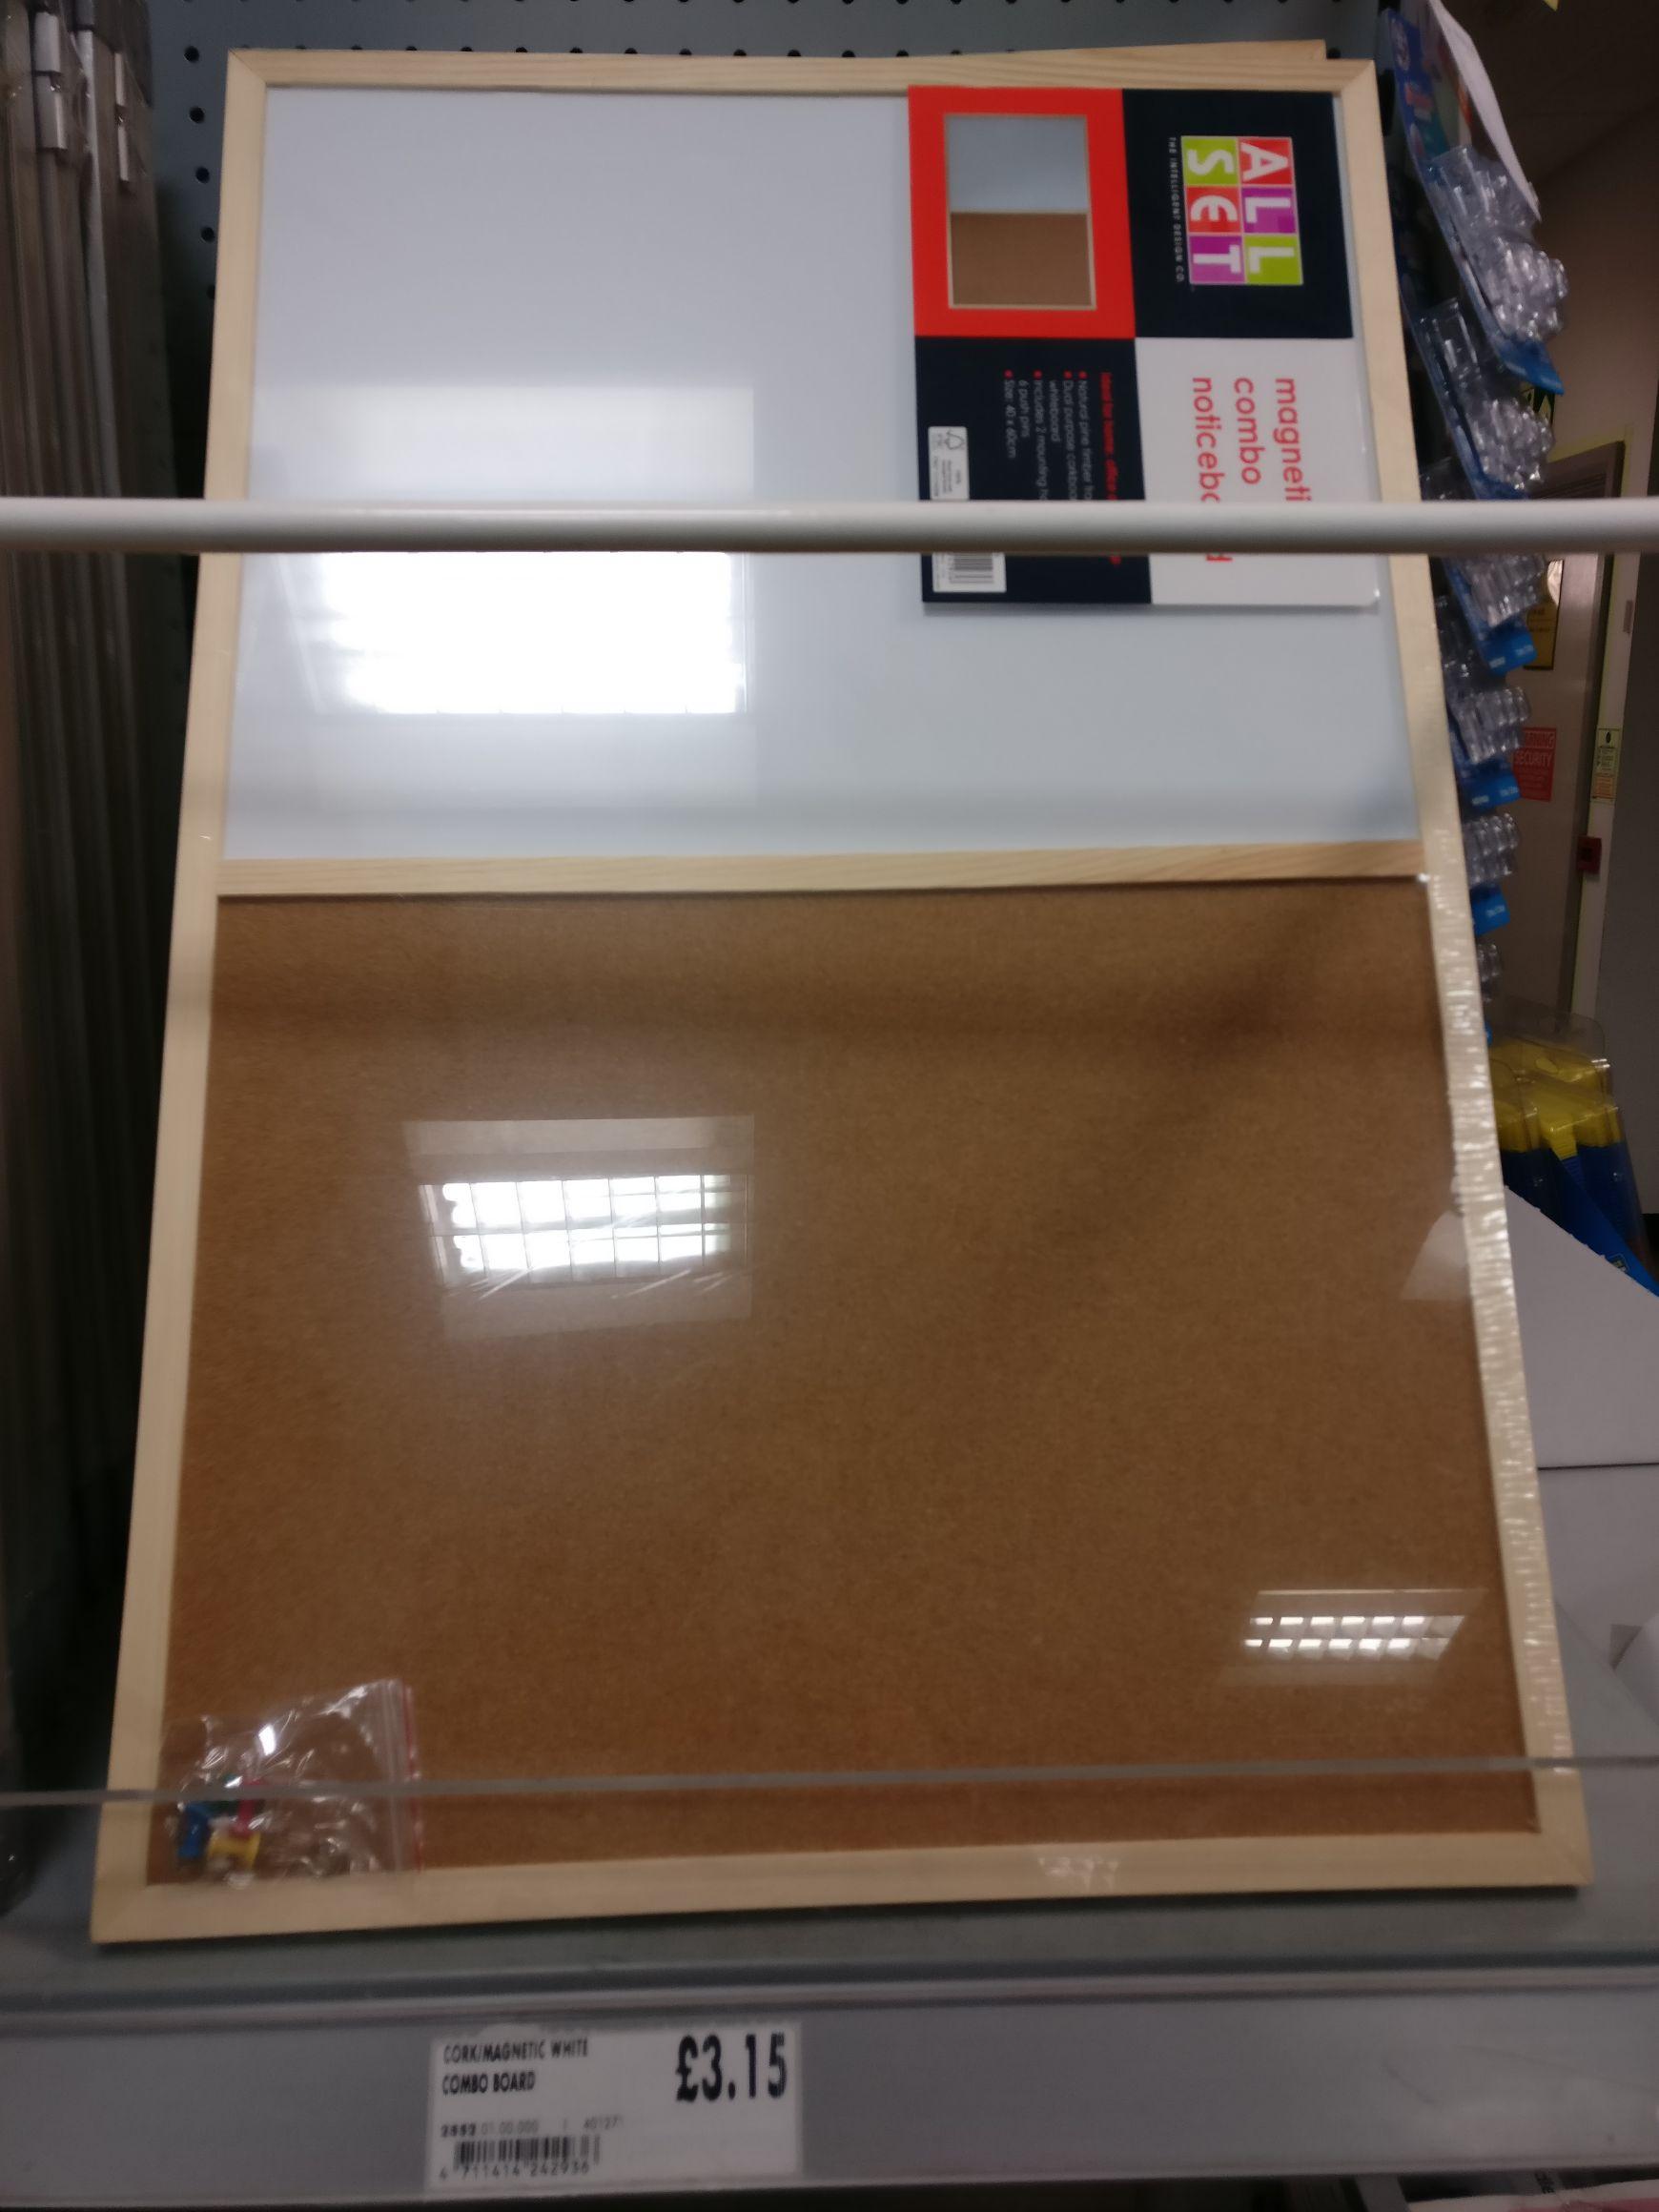 Magnetic whiteboard/noticeboard combo £3.15 @ Homebase